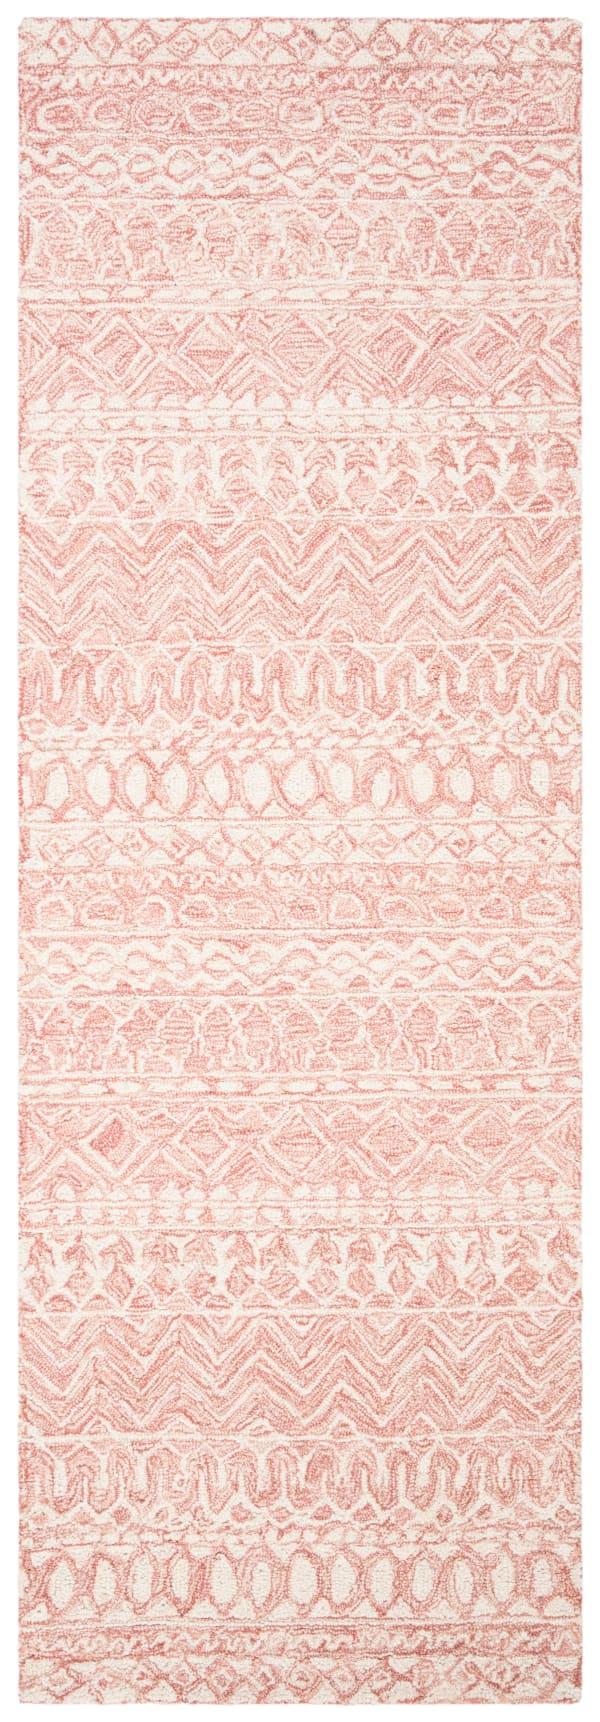 "Essence Pink Wool Rug 2'5"" x 4'"